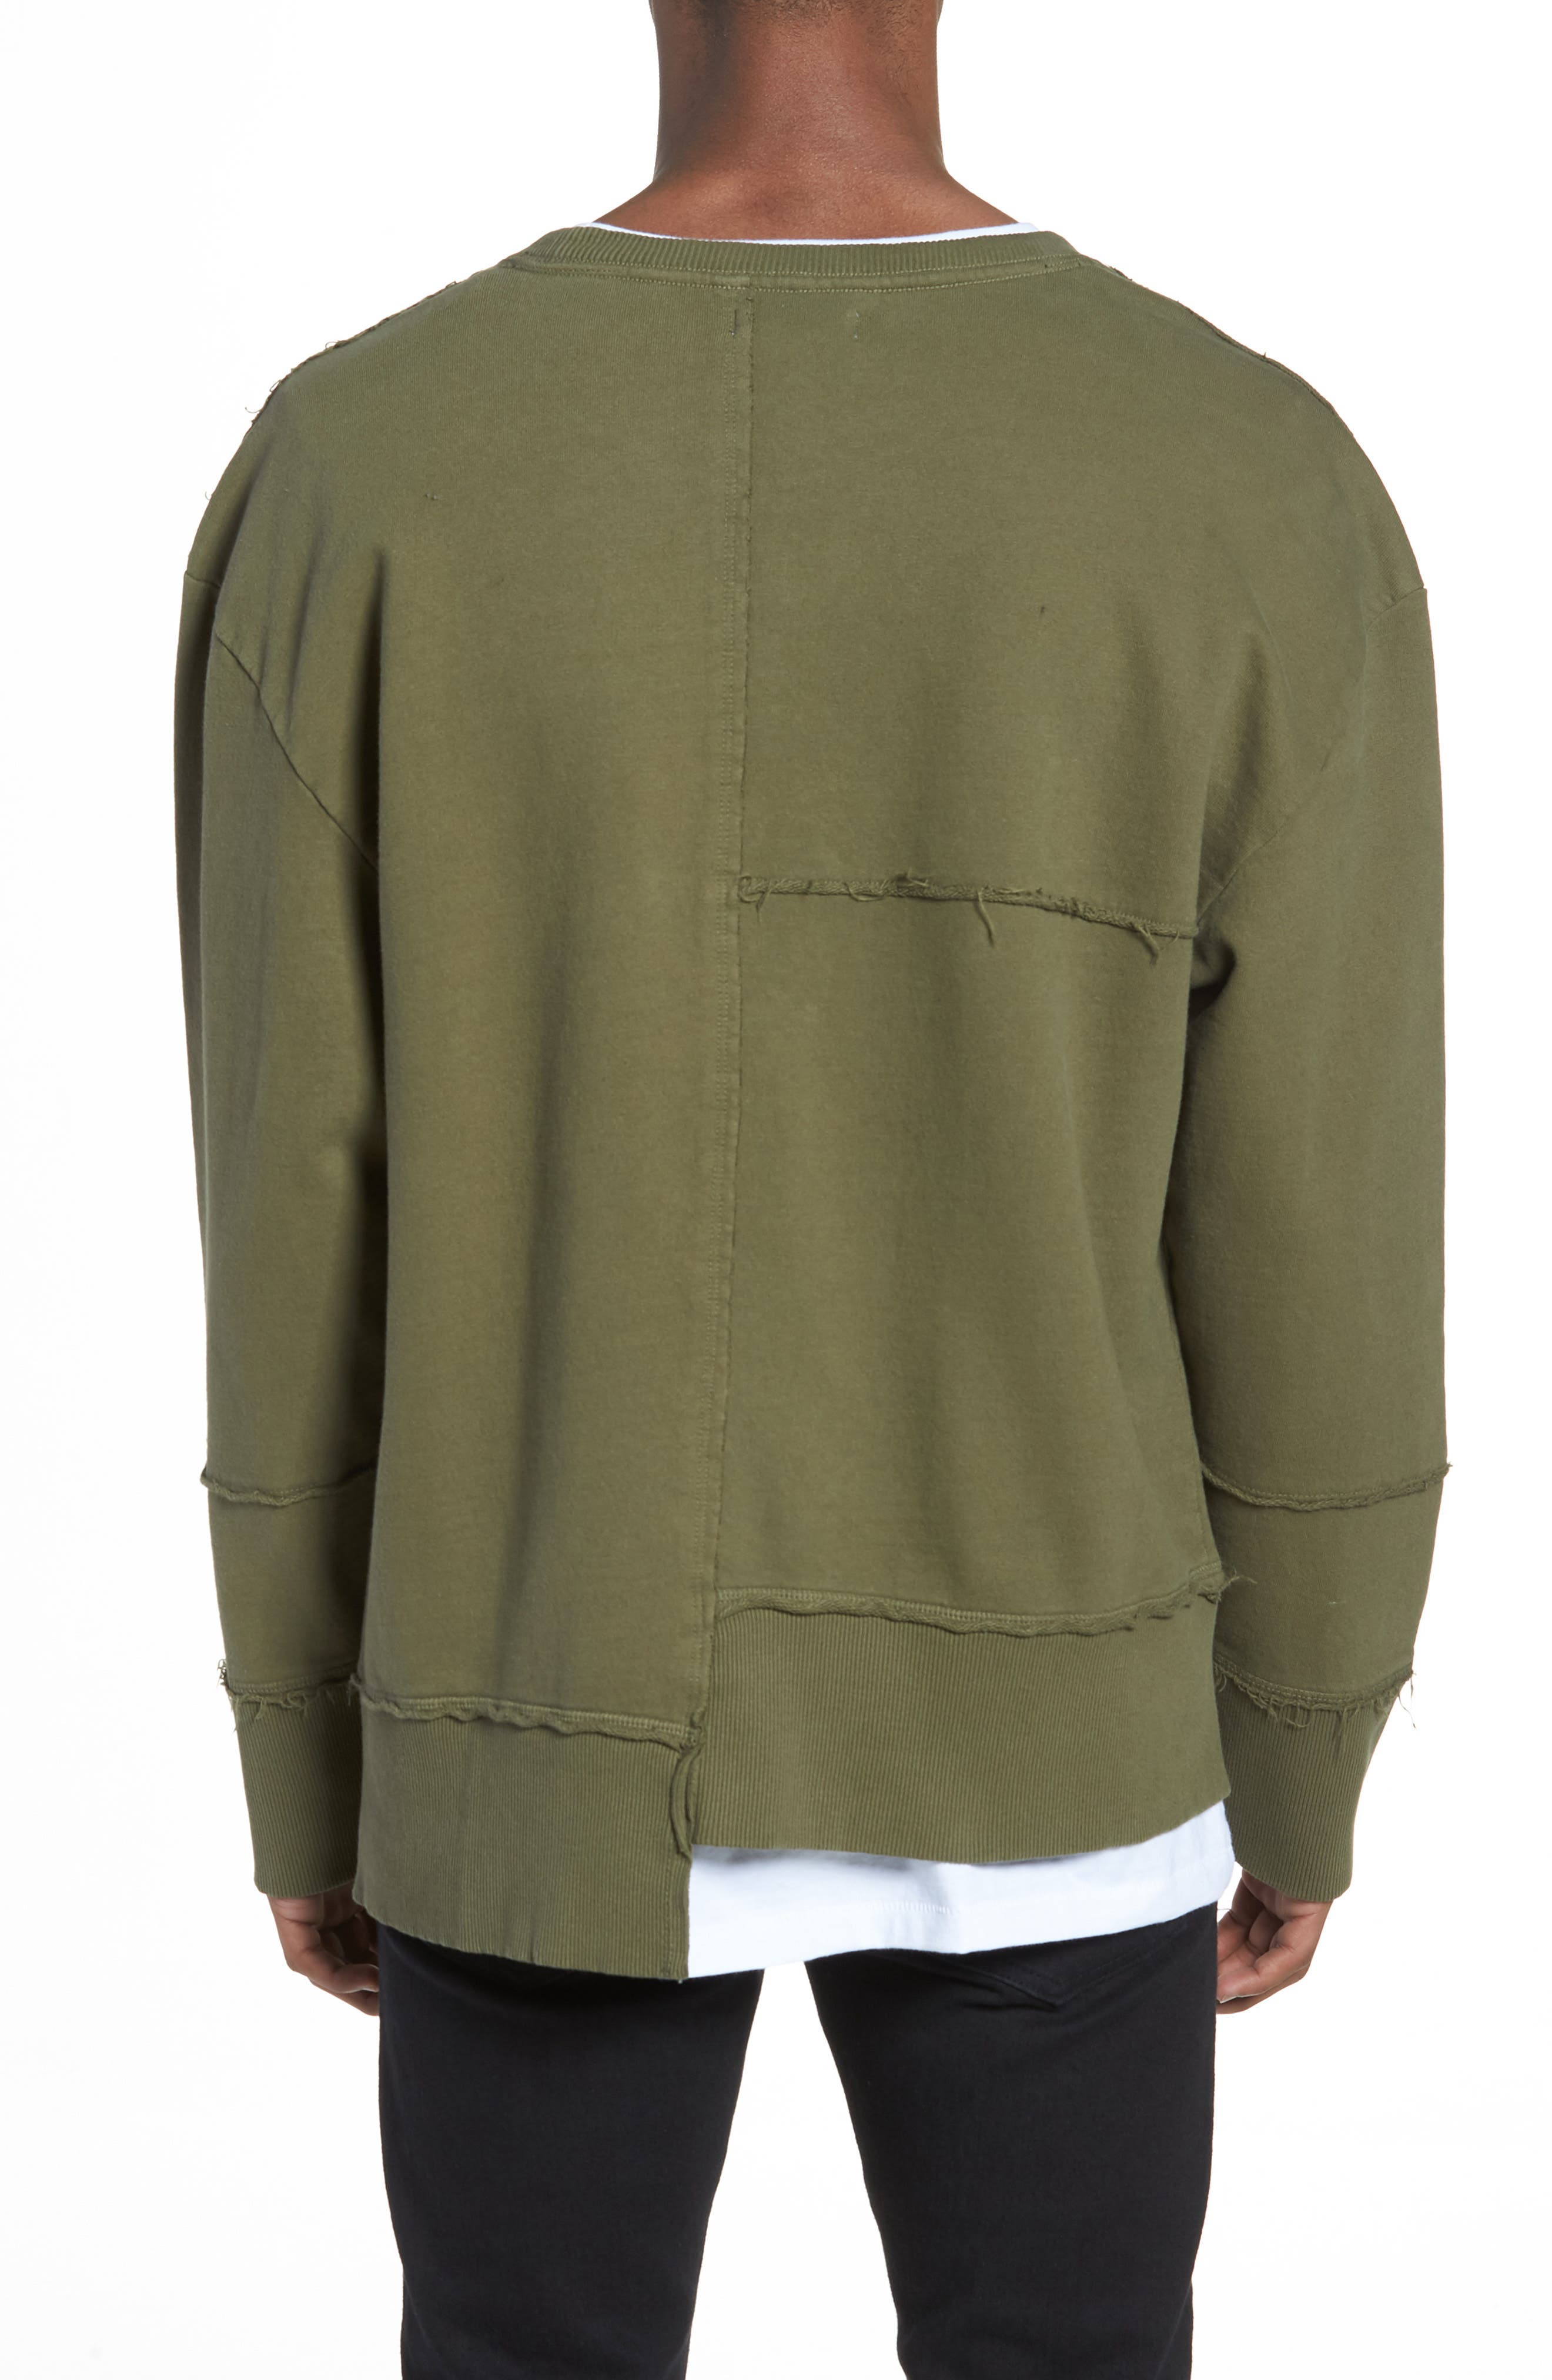 Splice Sweatshirt,                             Alternate thumbnail 2, color,                             311